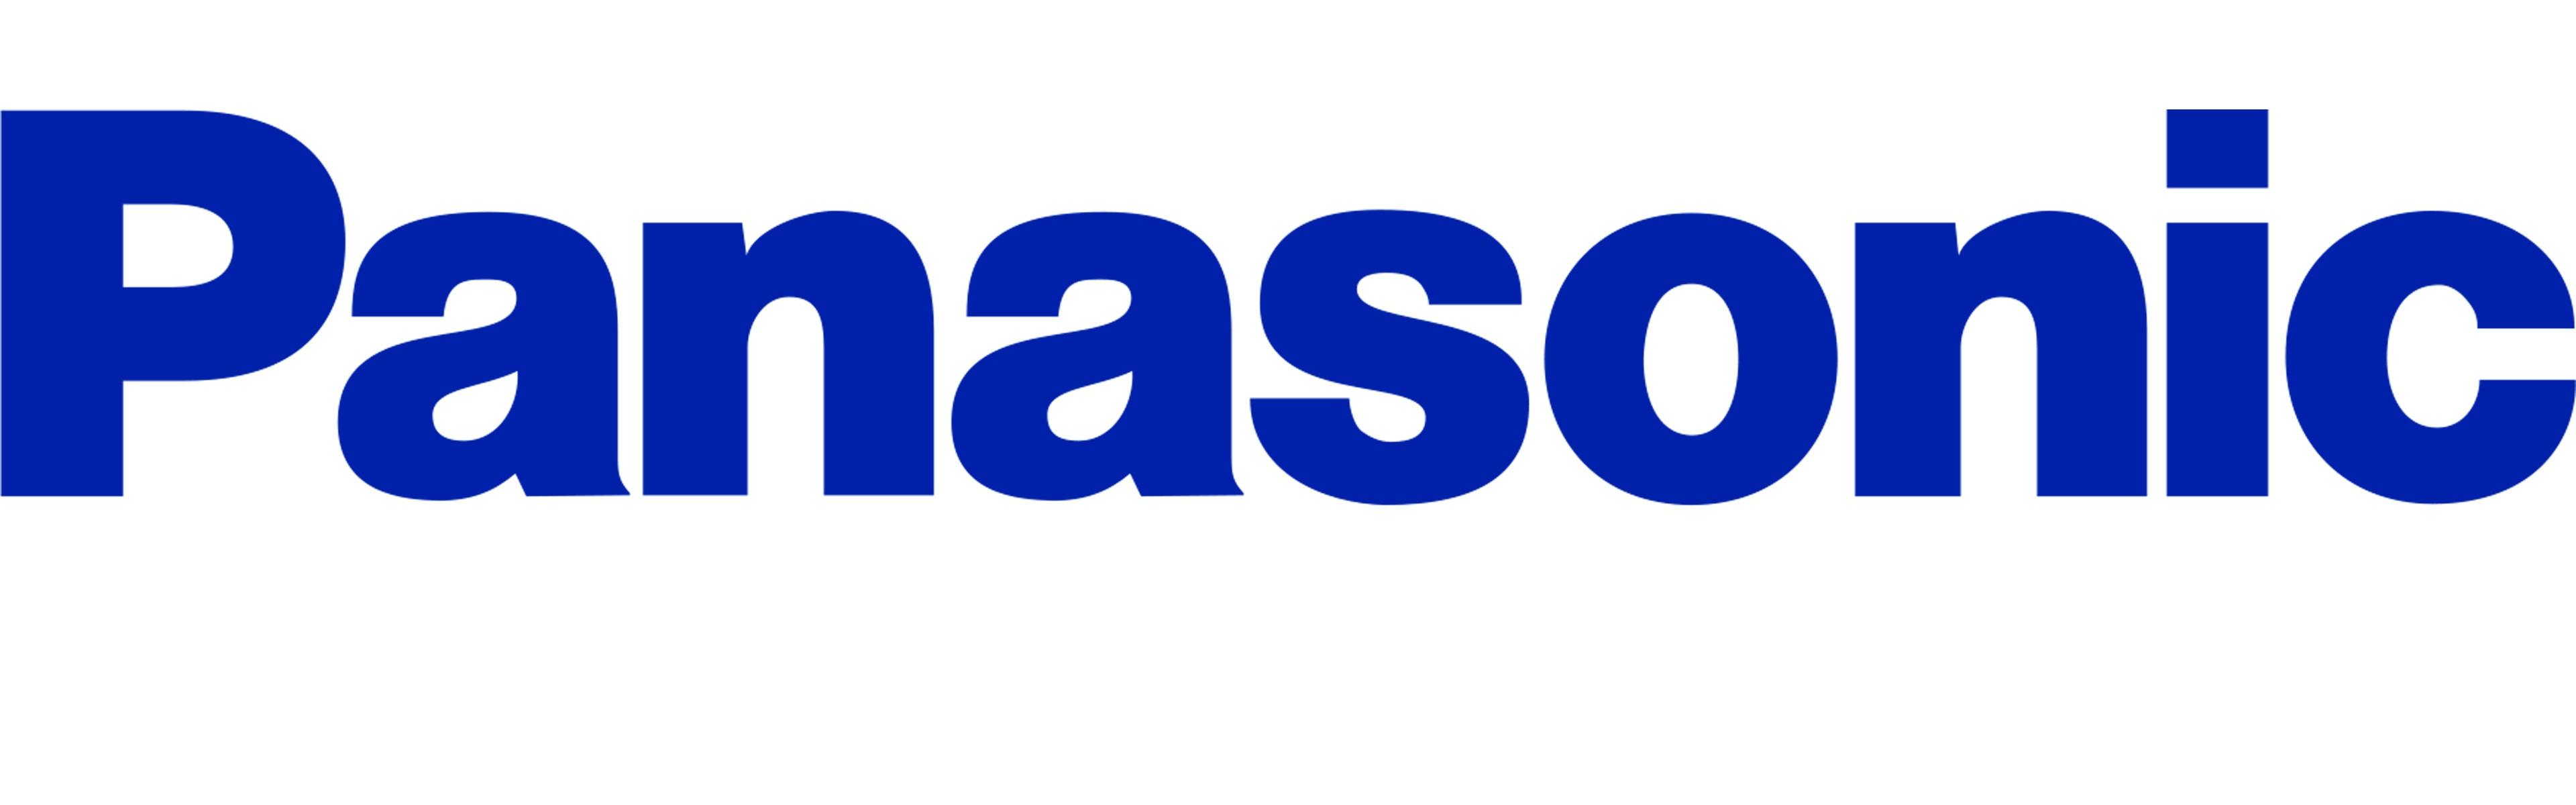 panasonic-logo-3840x1200.jpg